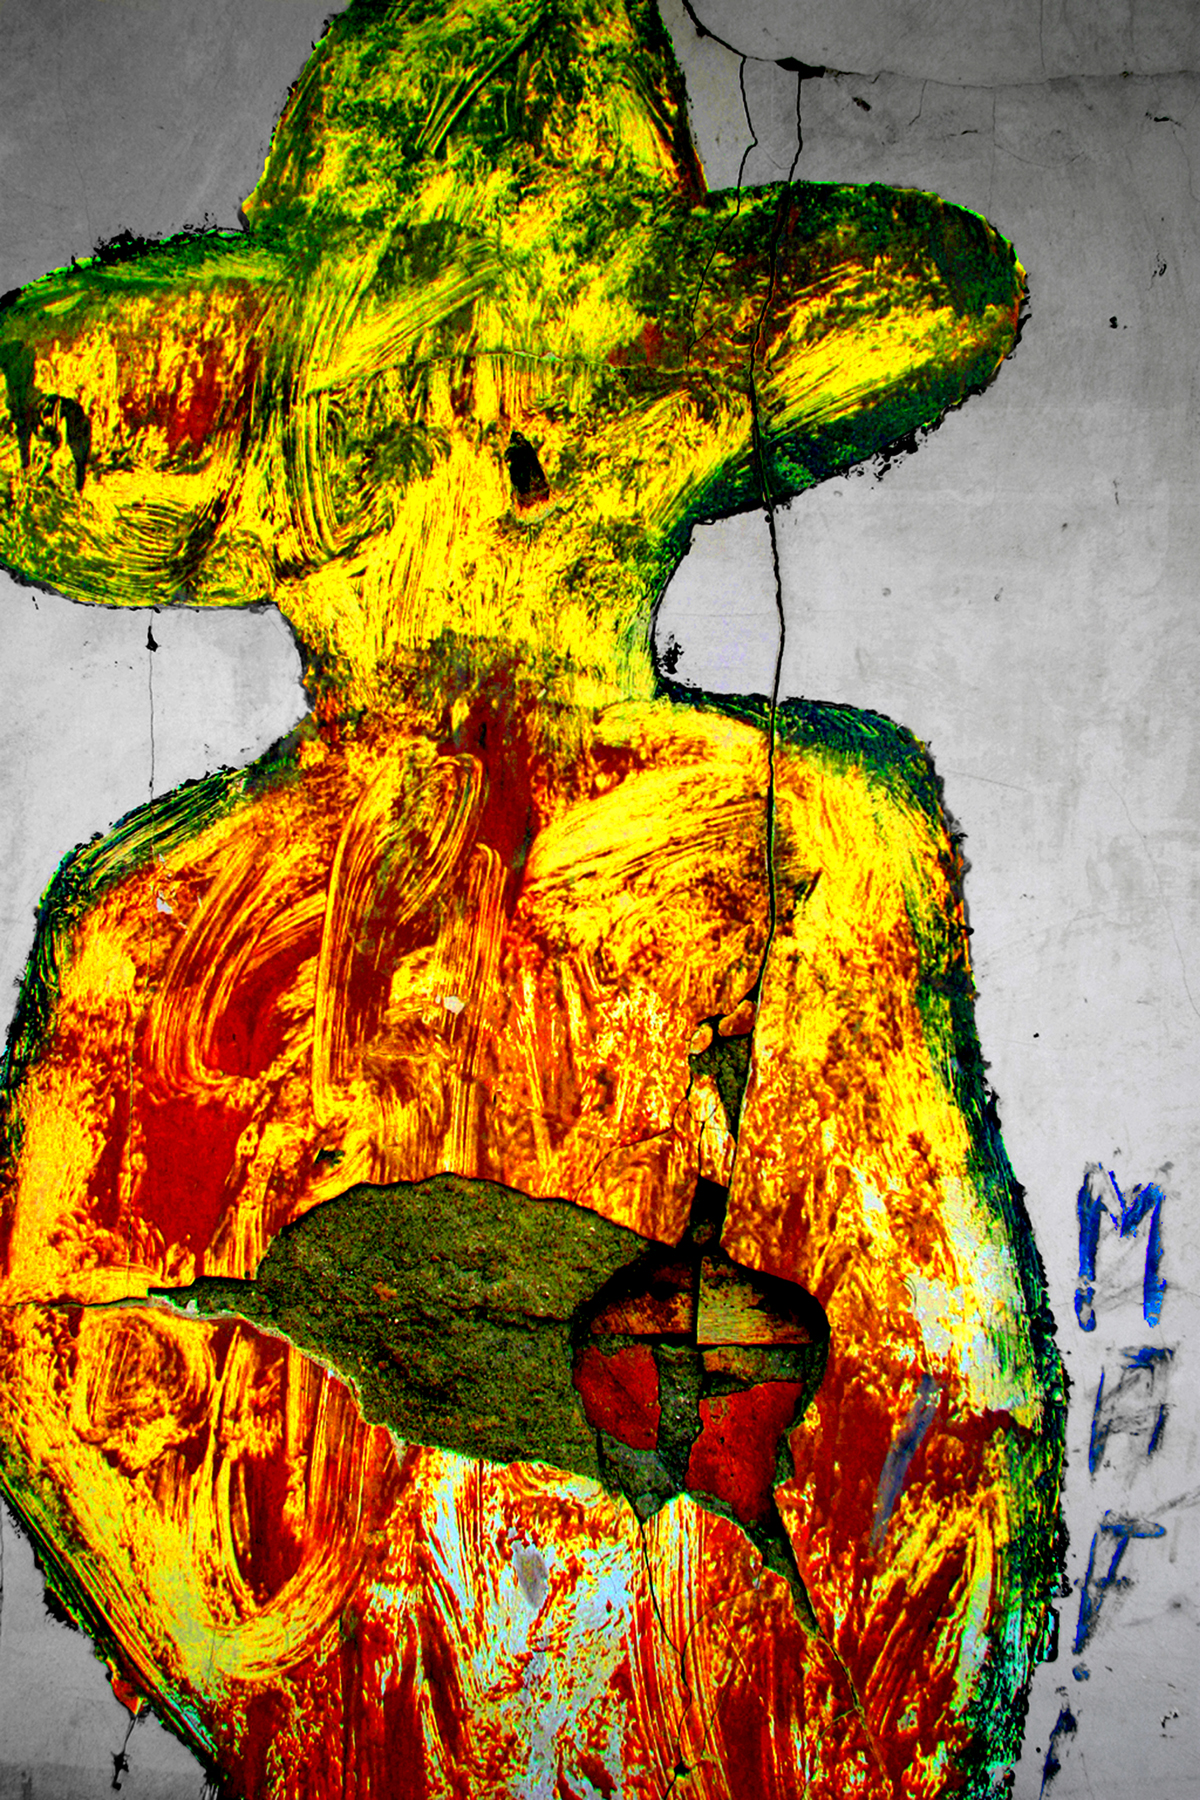 Sandino portrait, Leon, Nicaragua